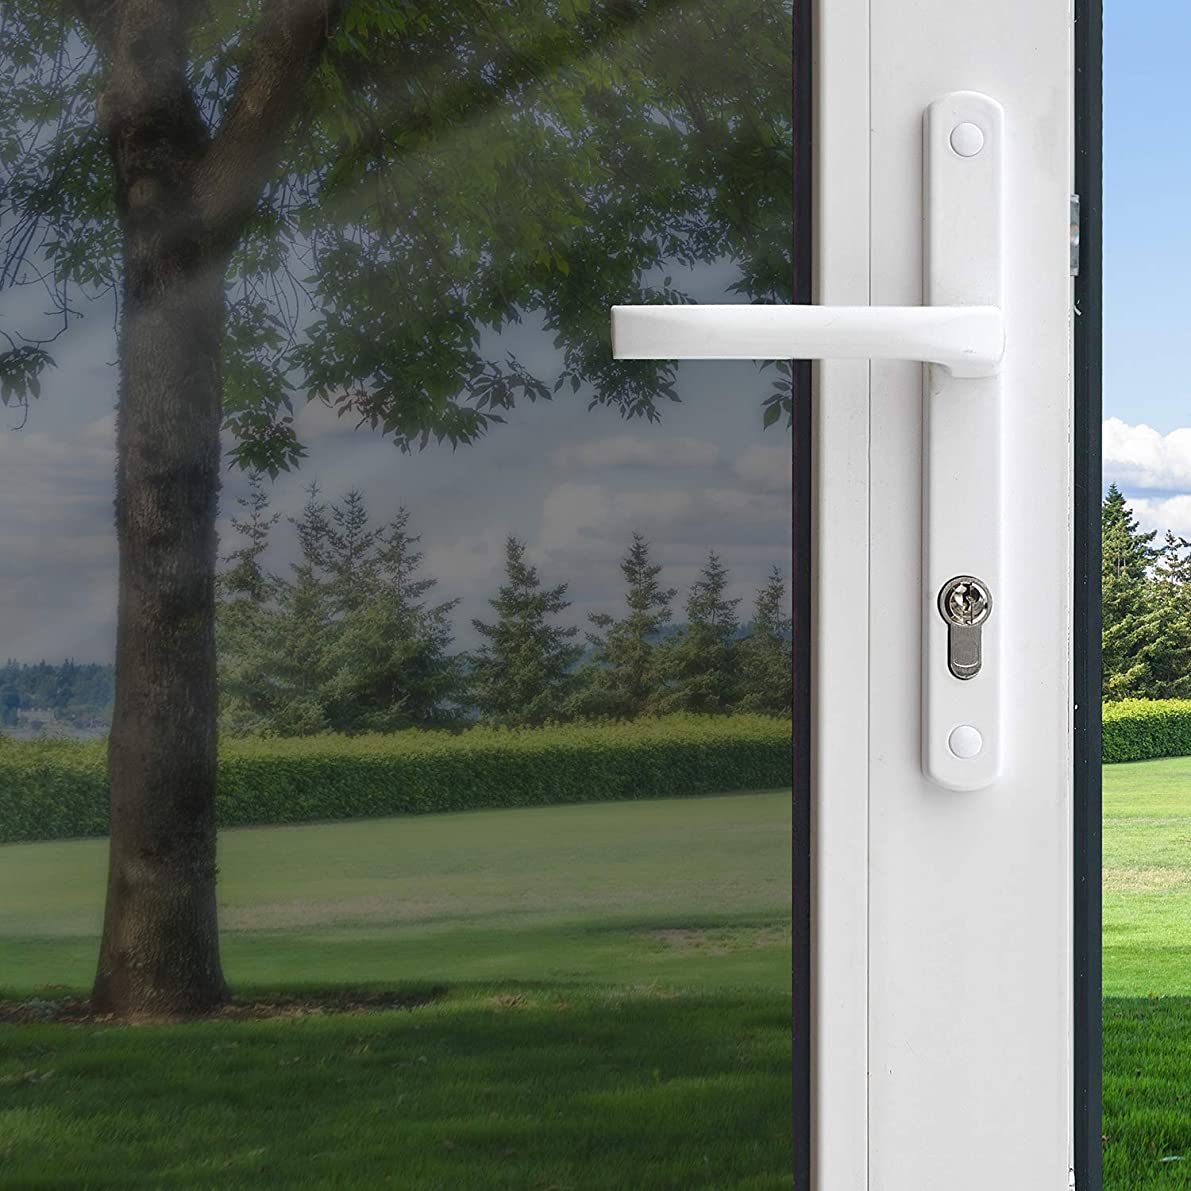 Gila Heat Control Platinum Adhesive Residential DIY Window Film Sun Blocking Glare Reduction 3ft x 15ft (36in x 180in)